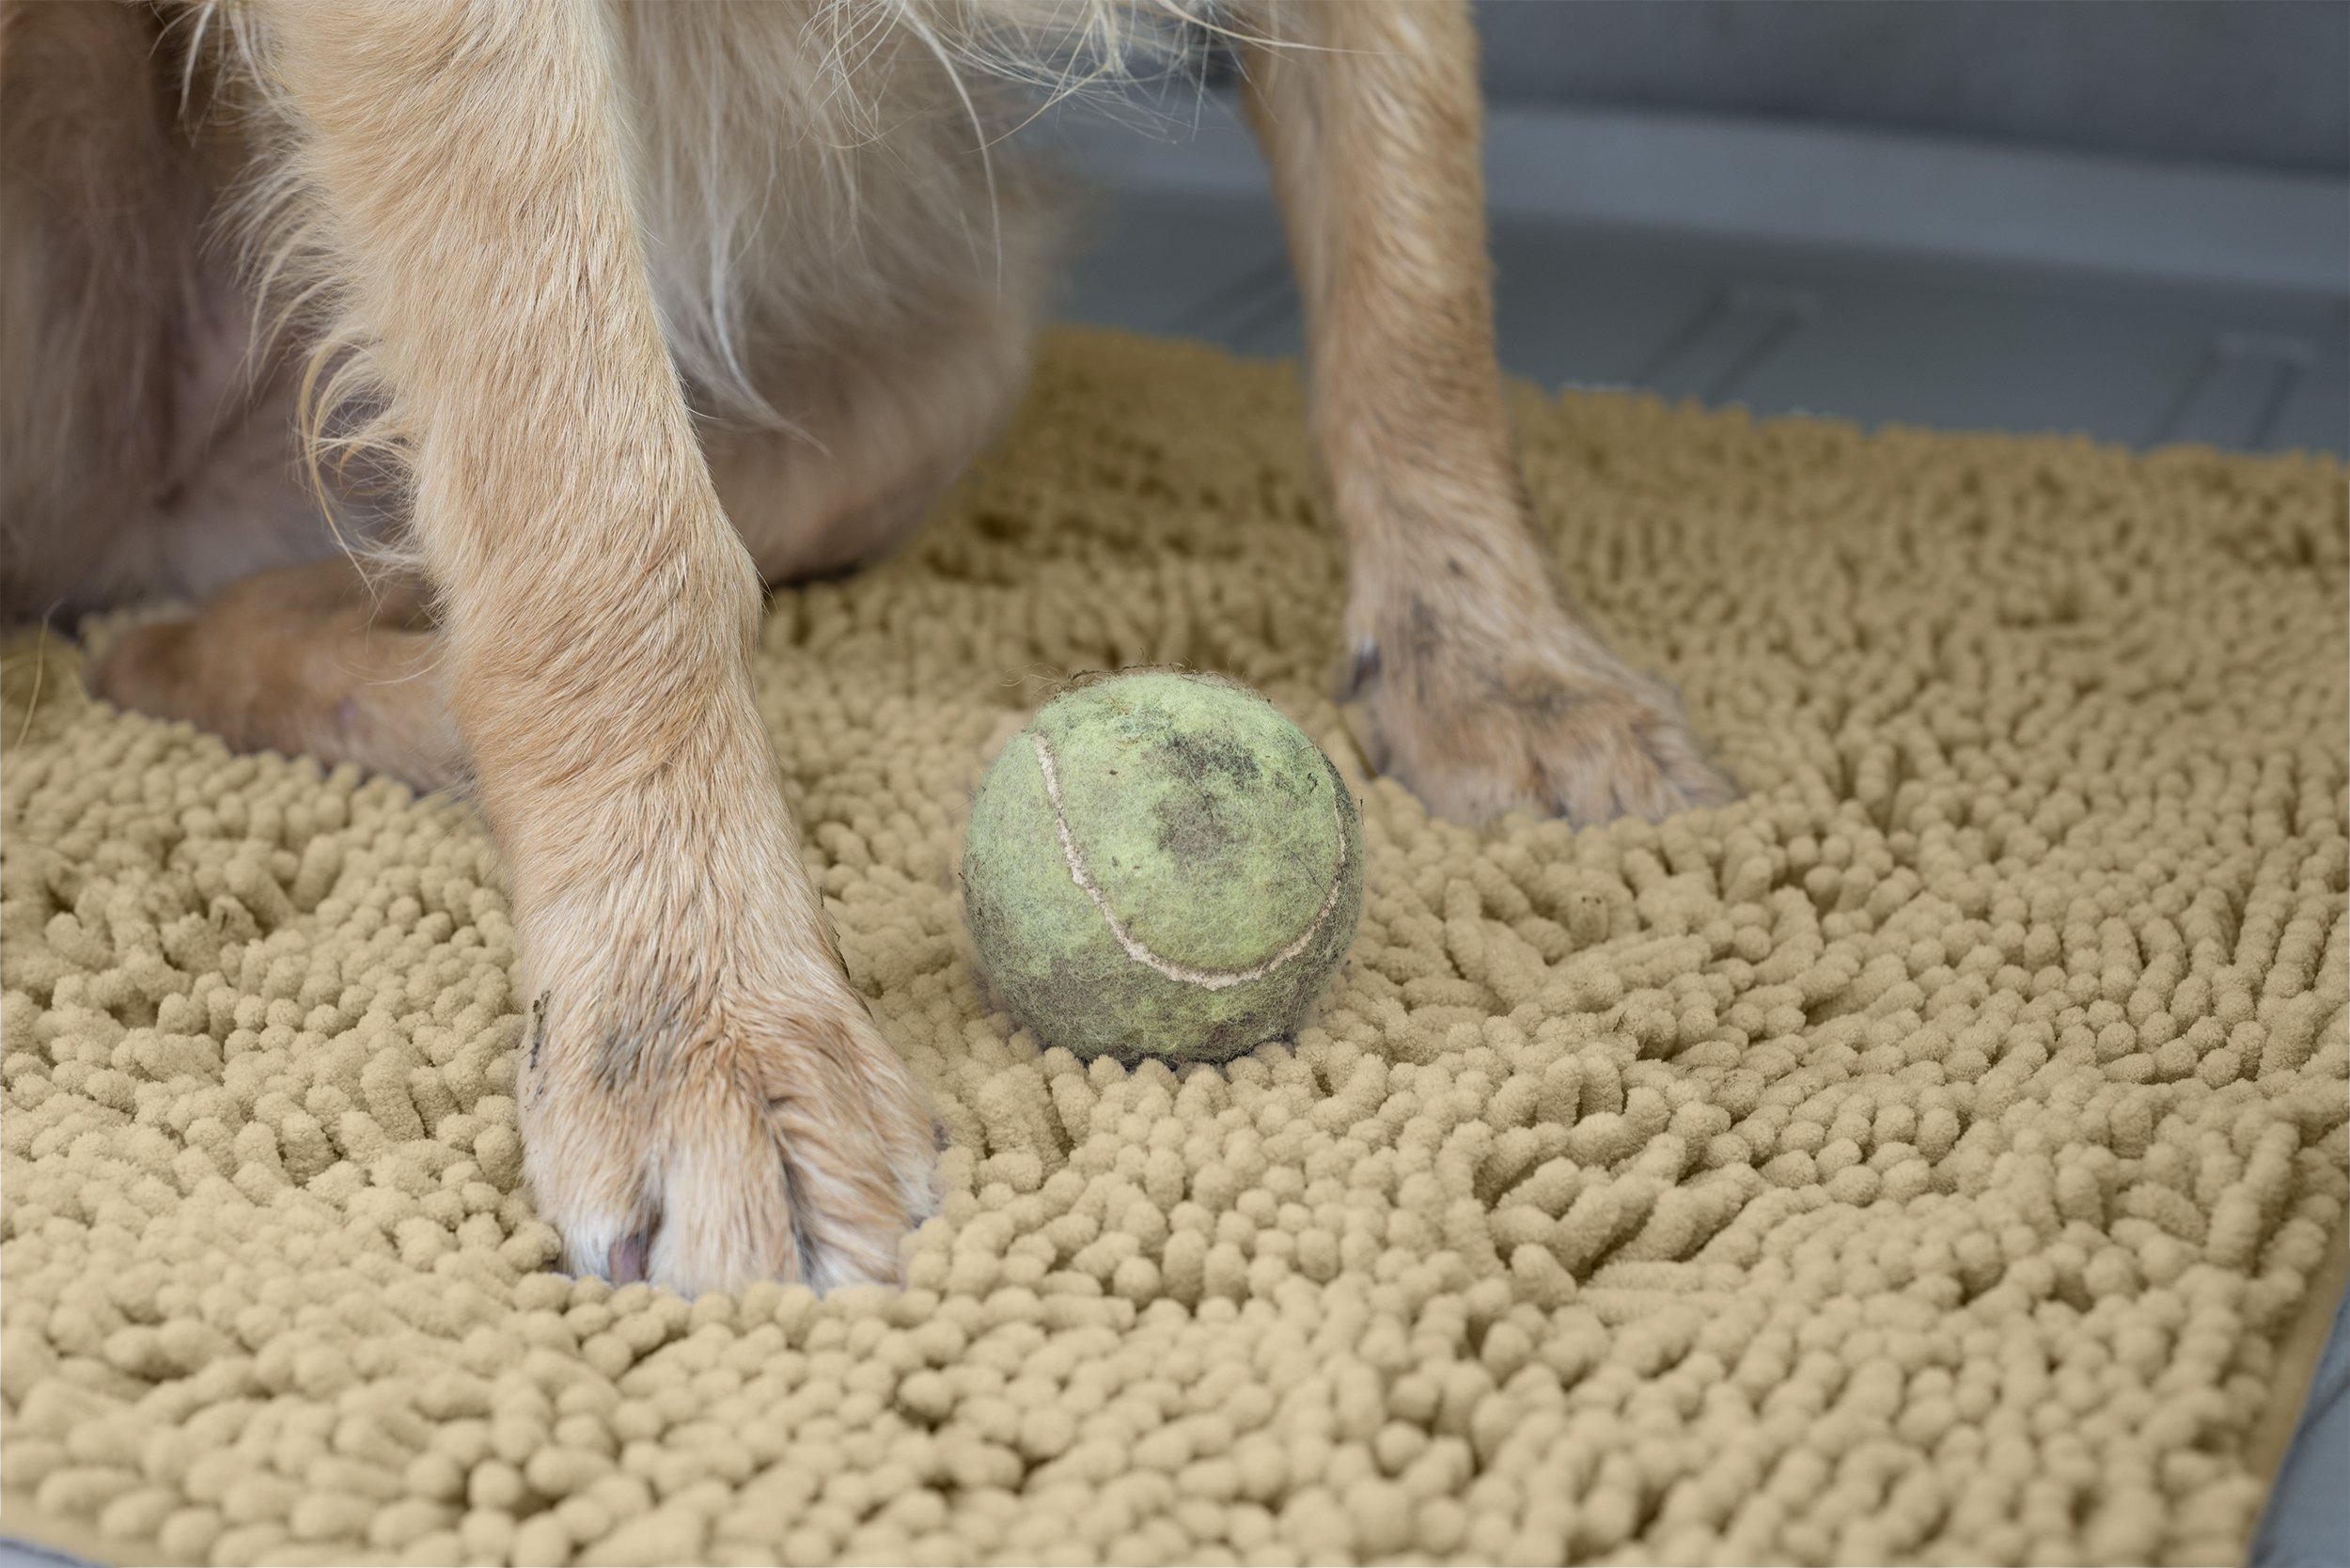 Furhaven Pet 80551613 Runner Muddy Paws Towel & Shammy Rug - Sand by Furhaven Pet (Image #6)